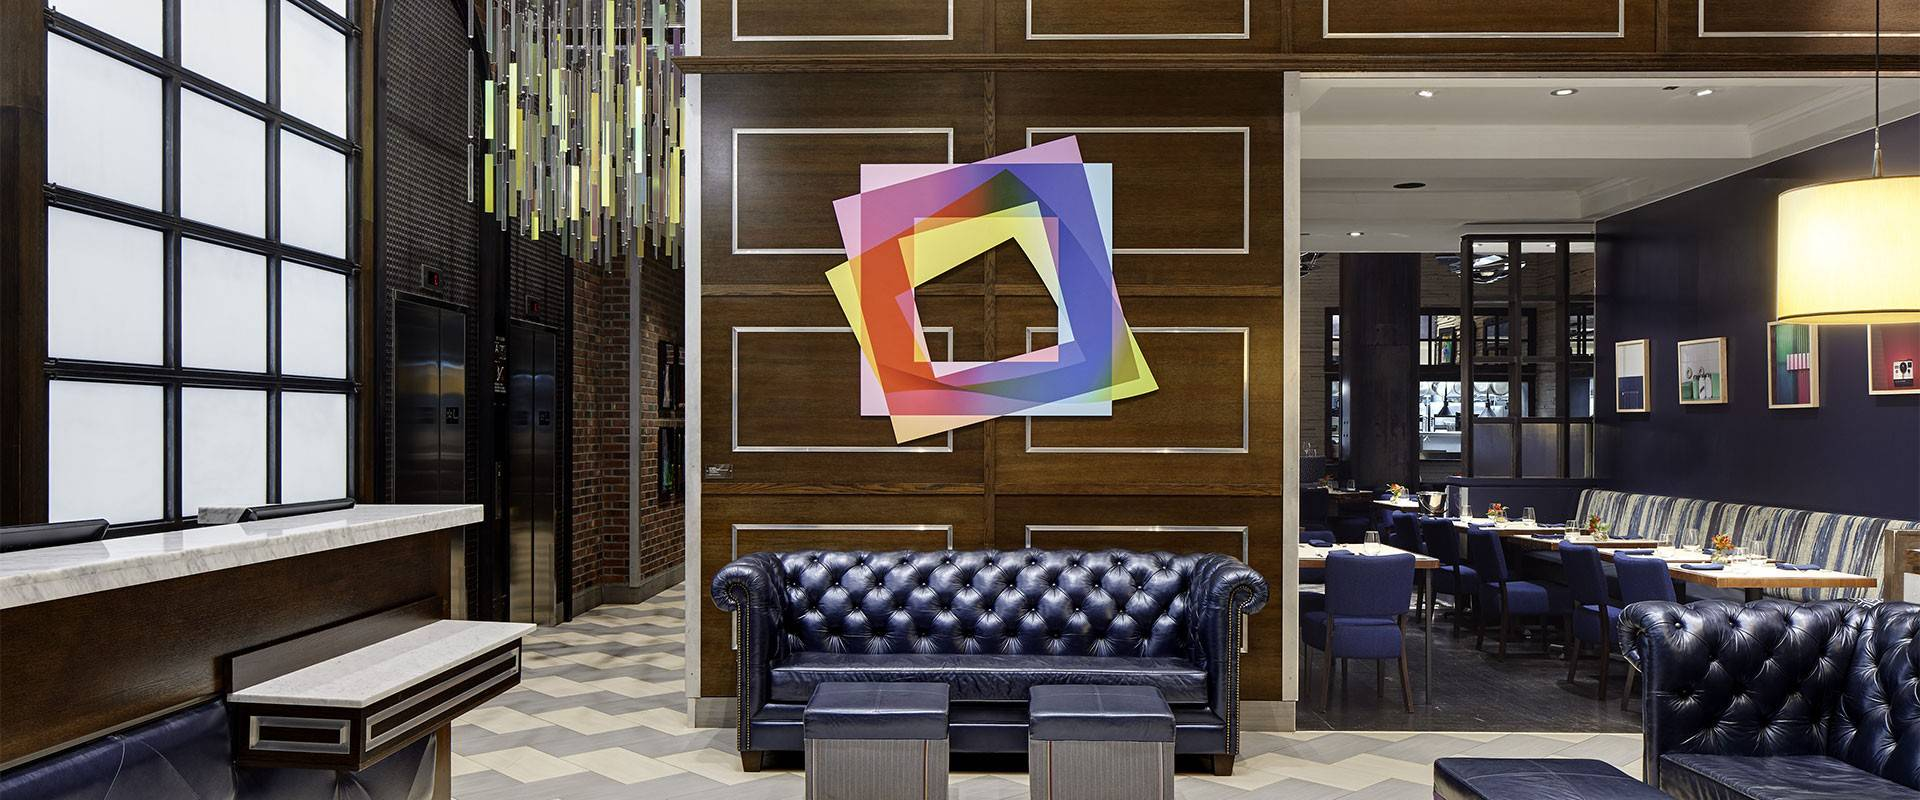 Archer Hotel New York lobby